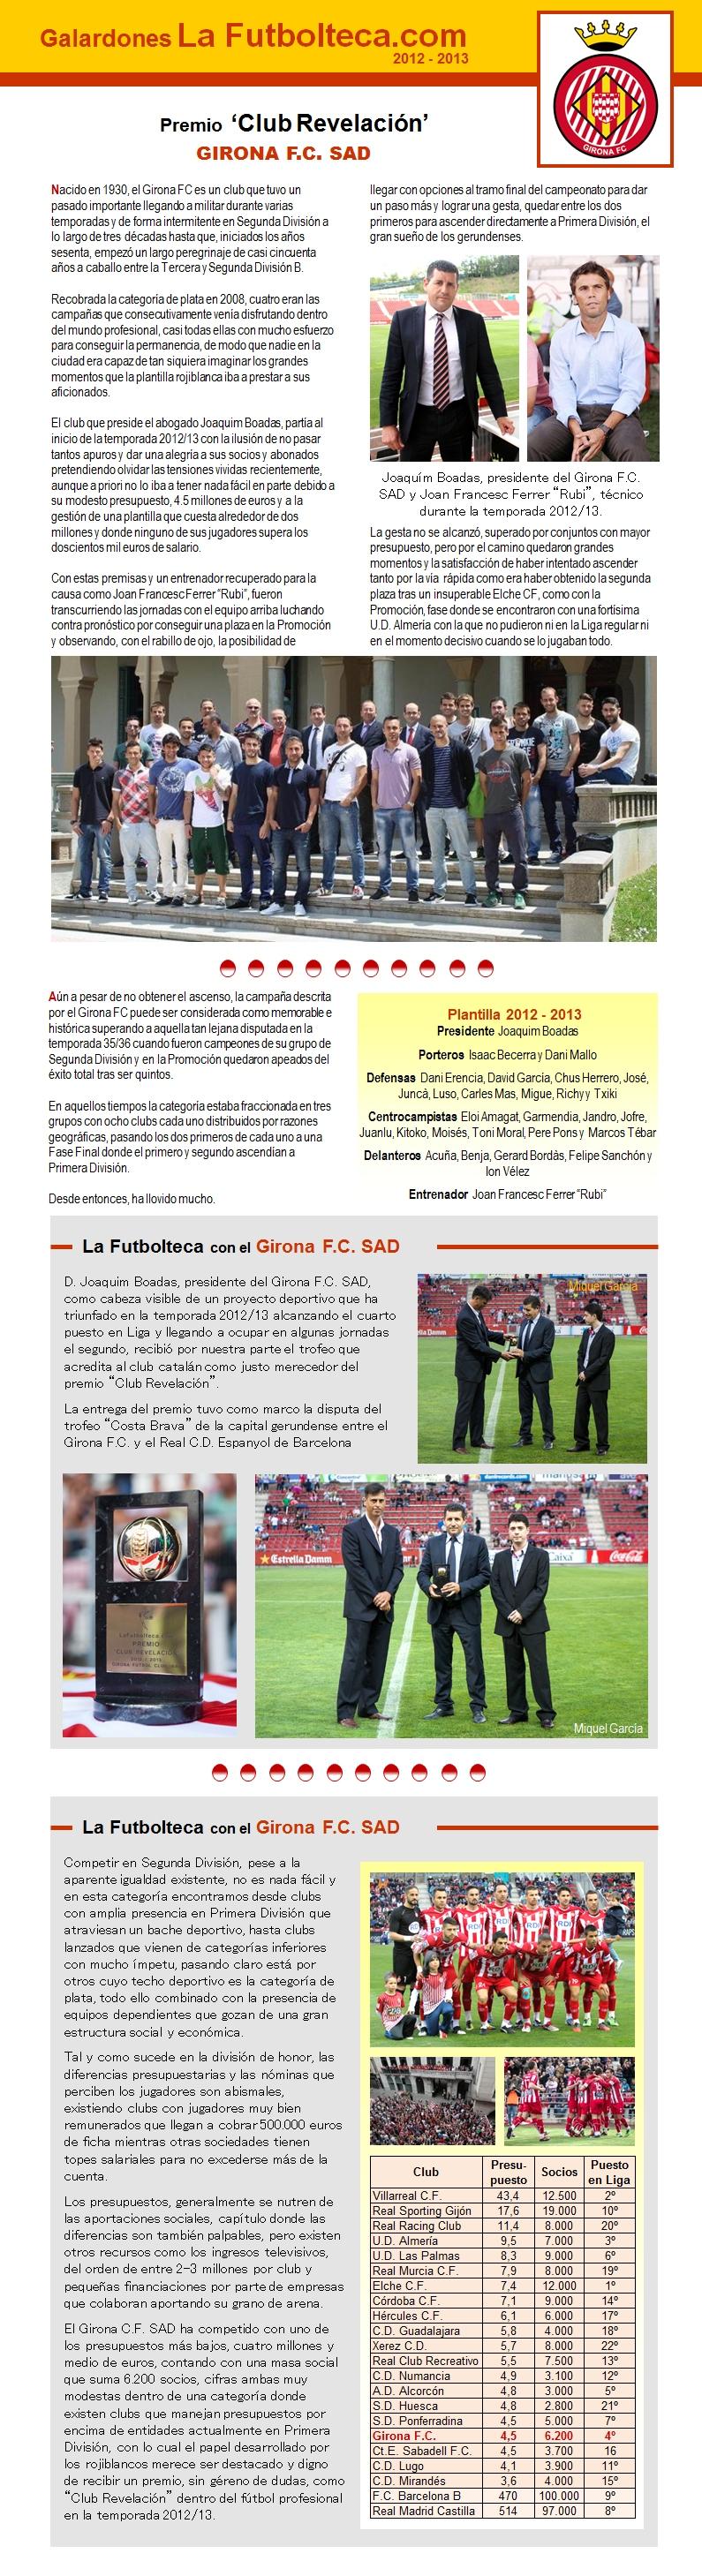 Premio Club Revelacion 2013 Girona FC